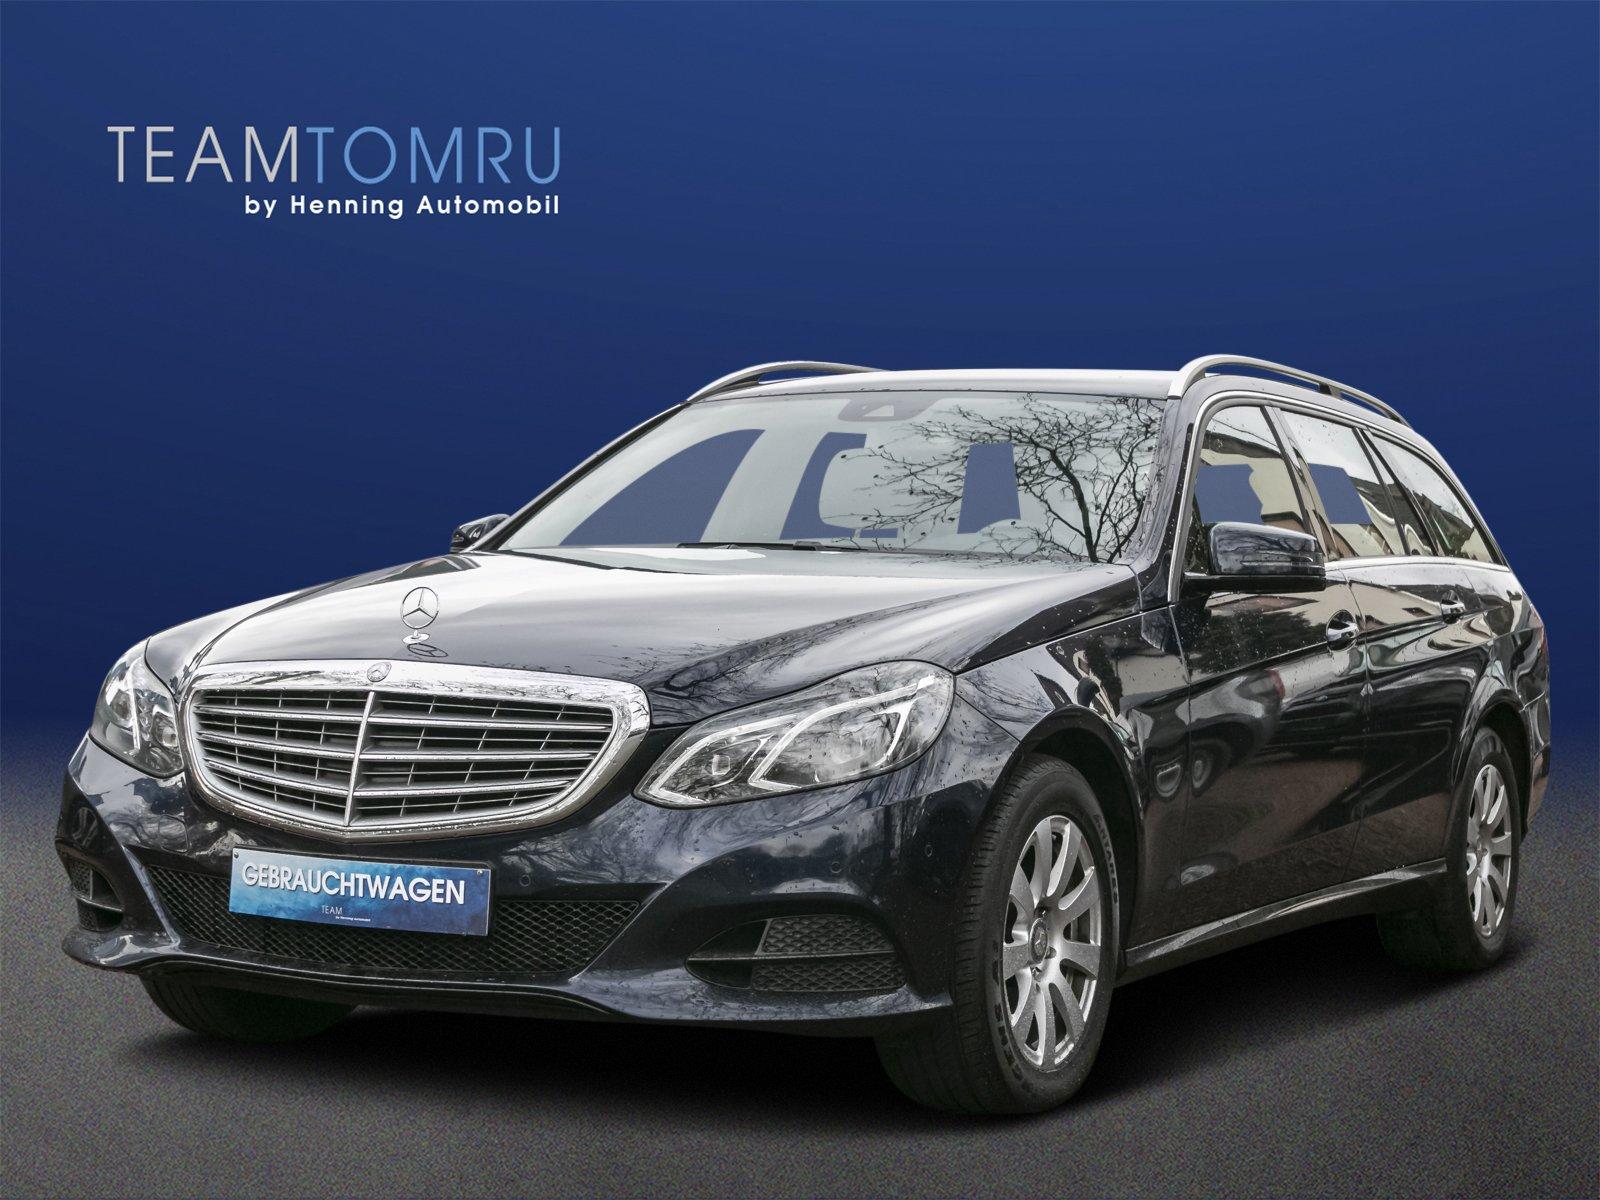 Mercedes-Benz E 220 T CDI COMAND Standhzg. Harman Kardon uvm., Jahr 2014, Diesel